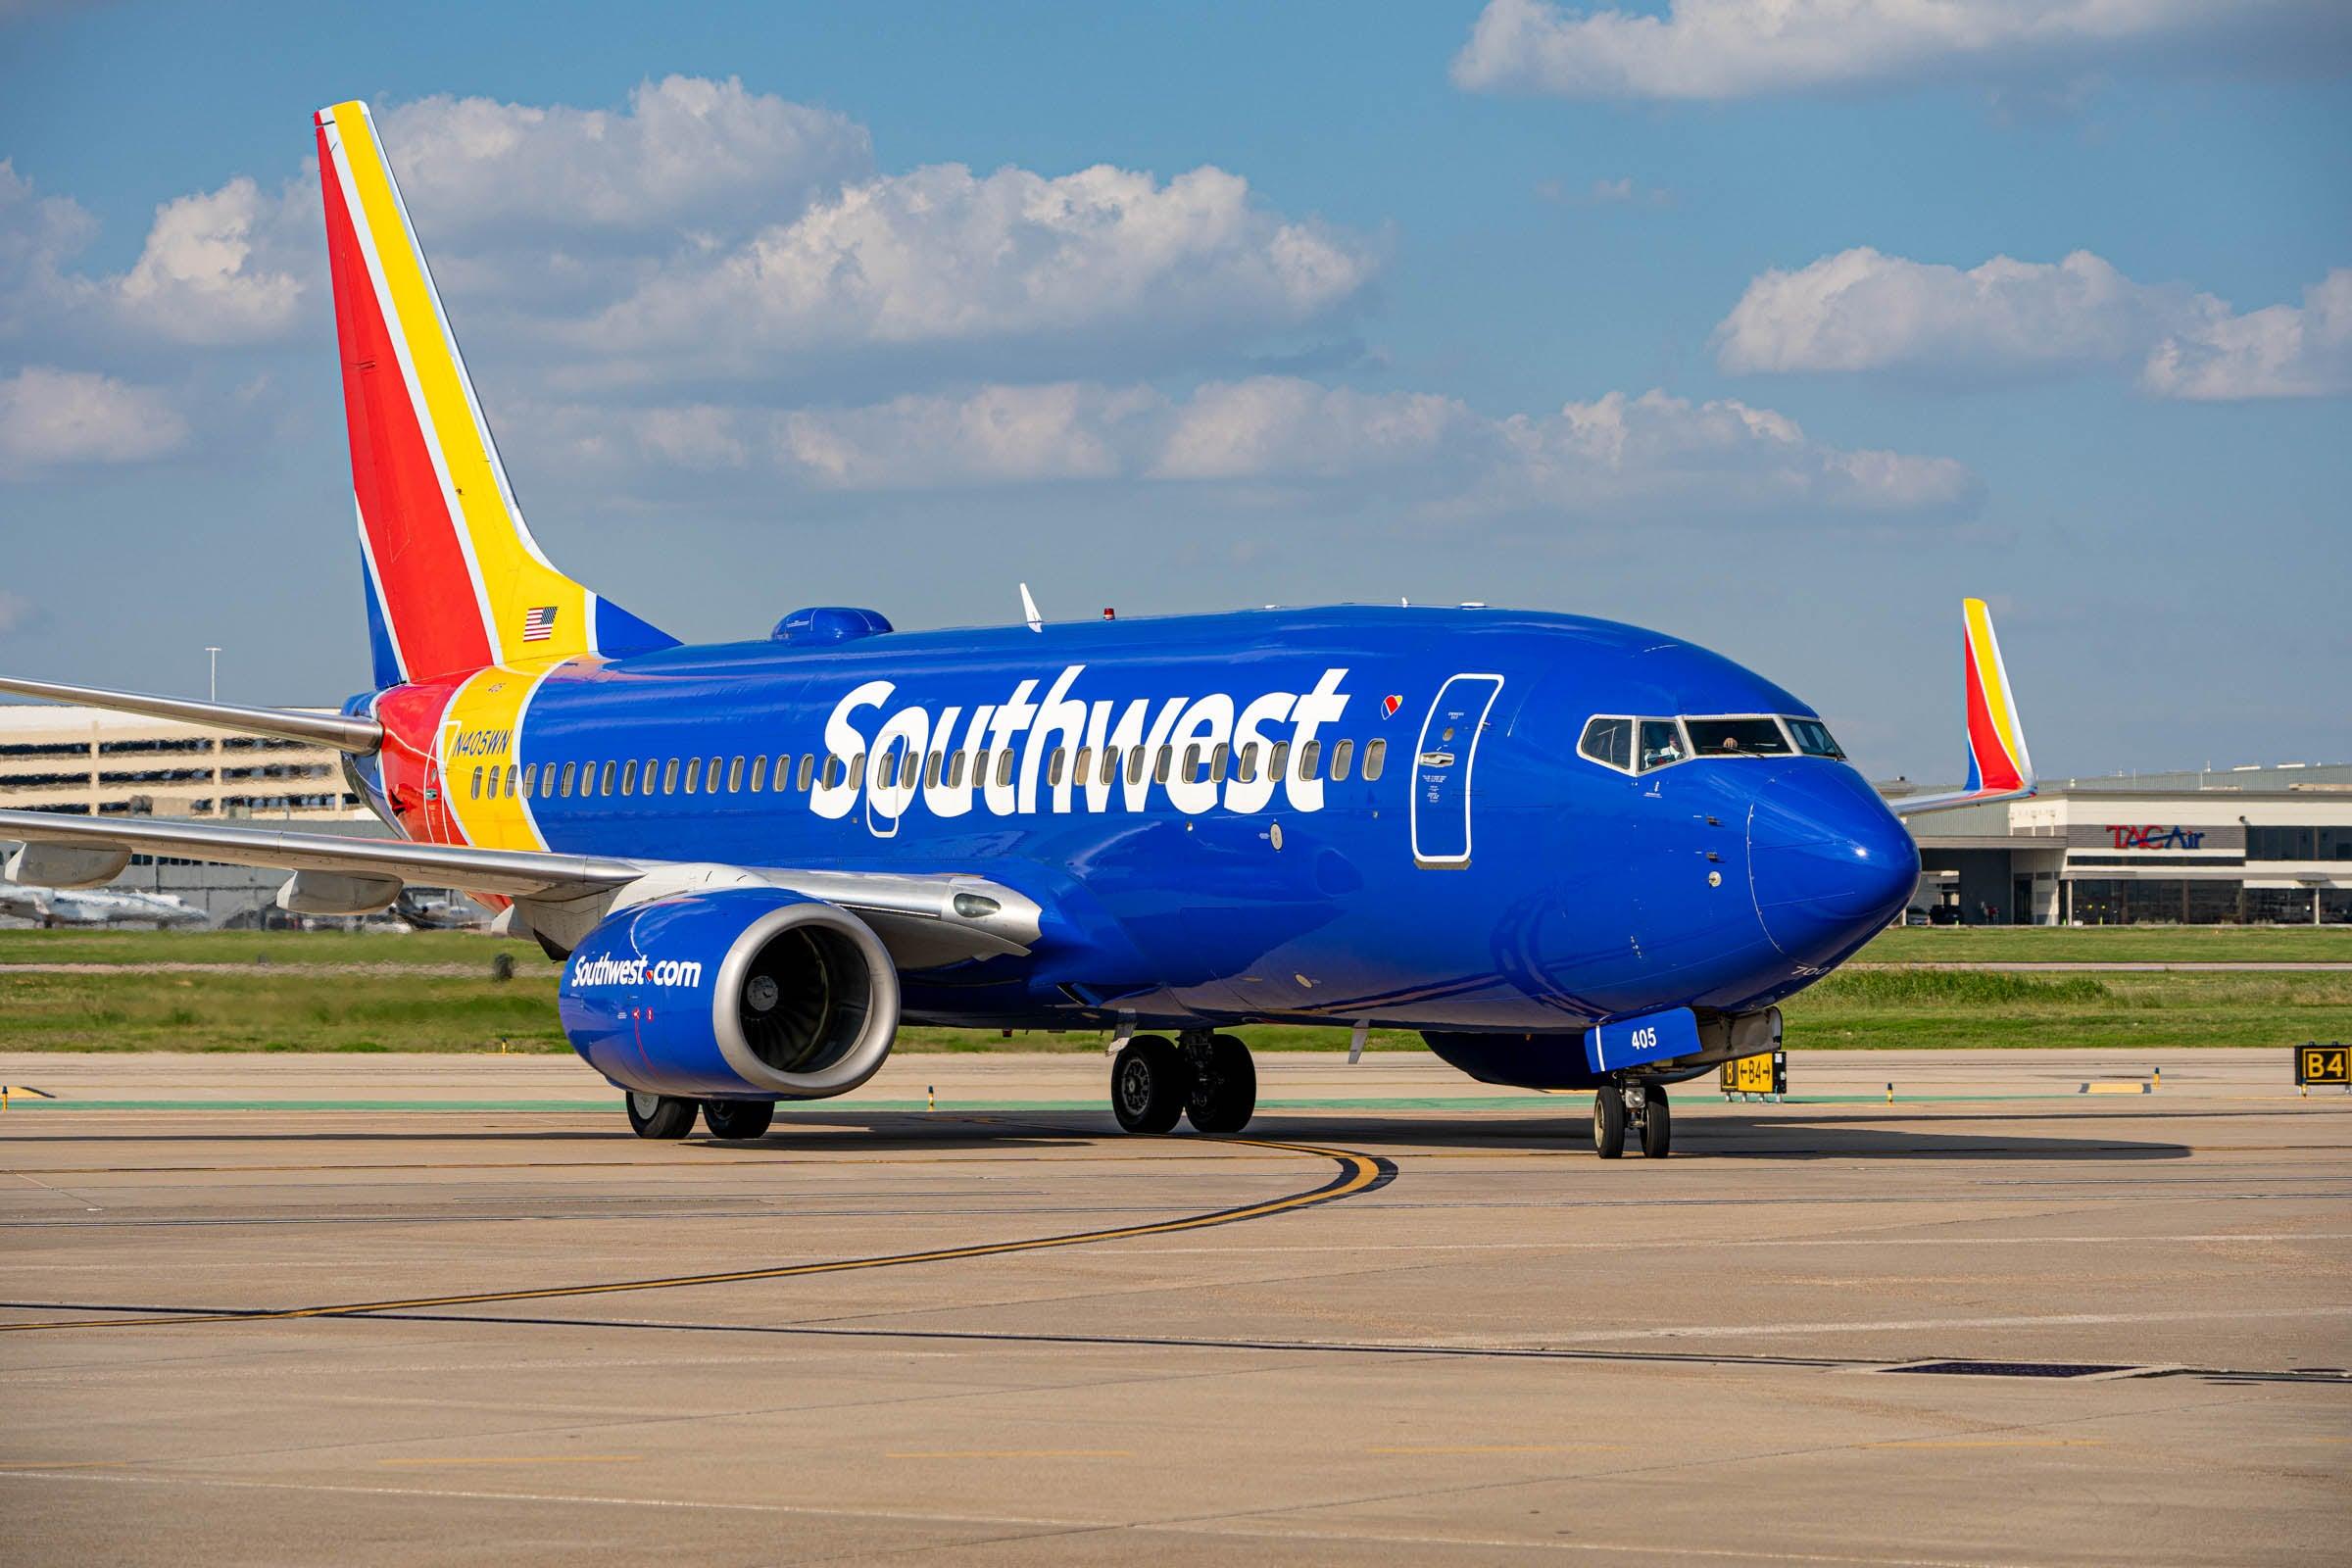 Southwest new CEO denies walk-off rumors, defends pilots amid schedule meltdown